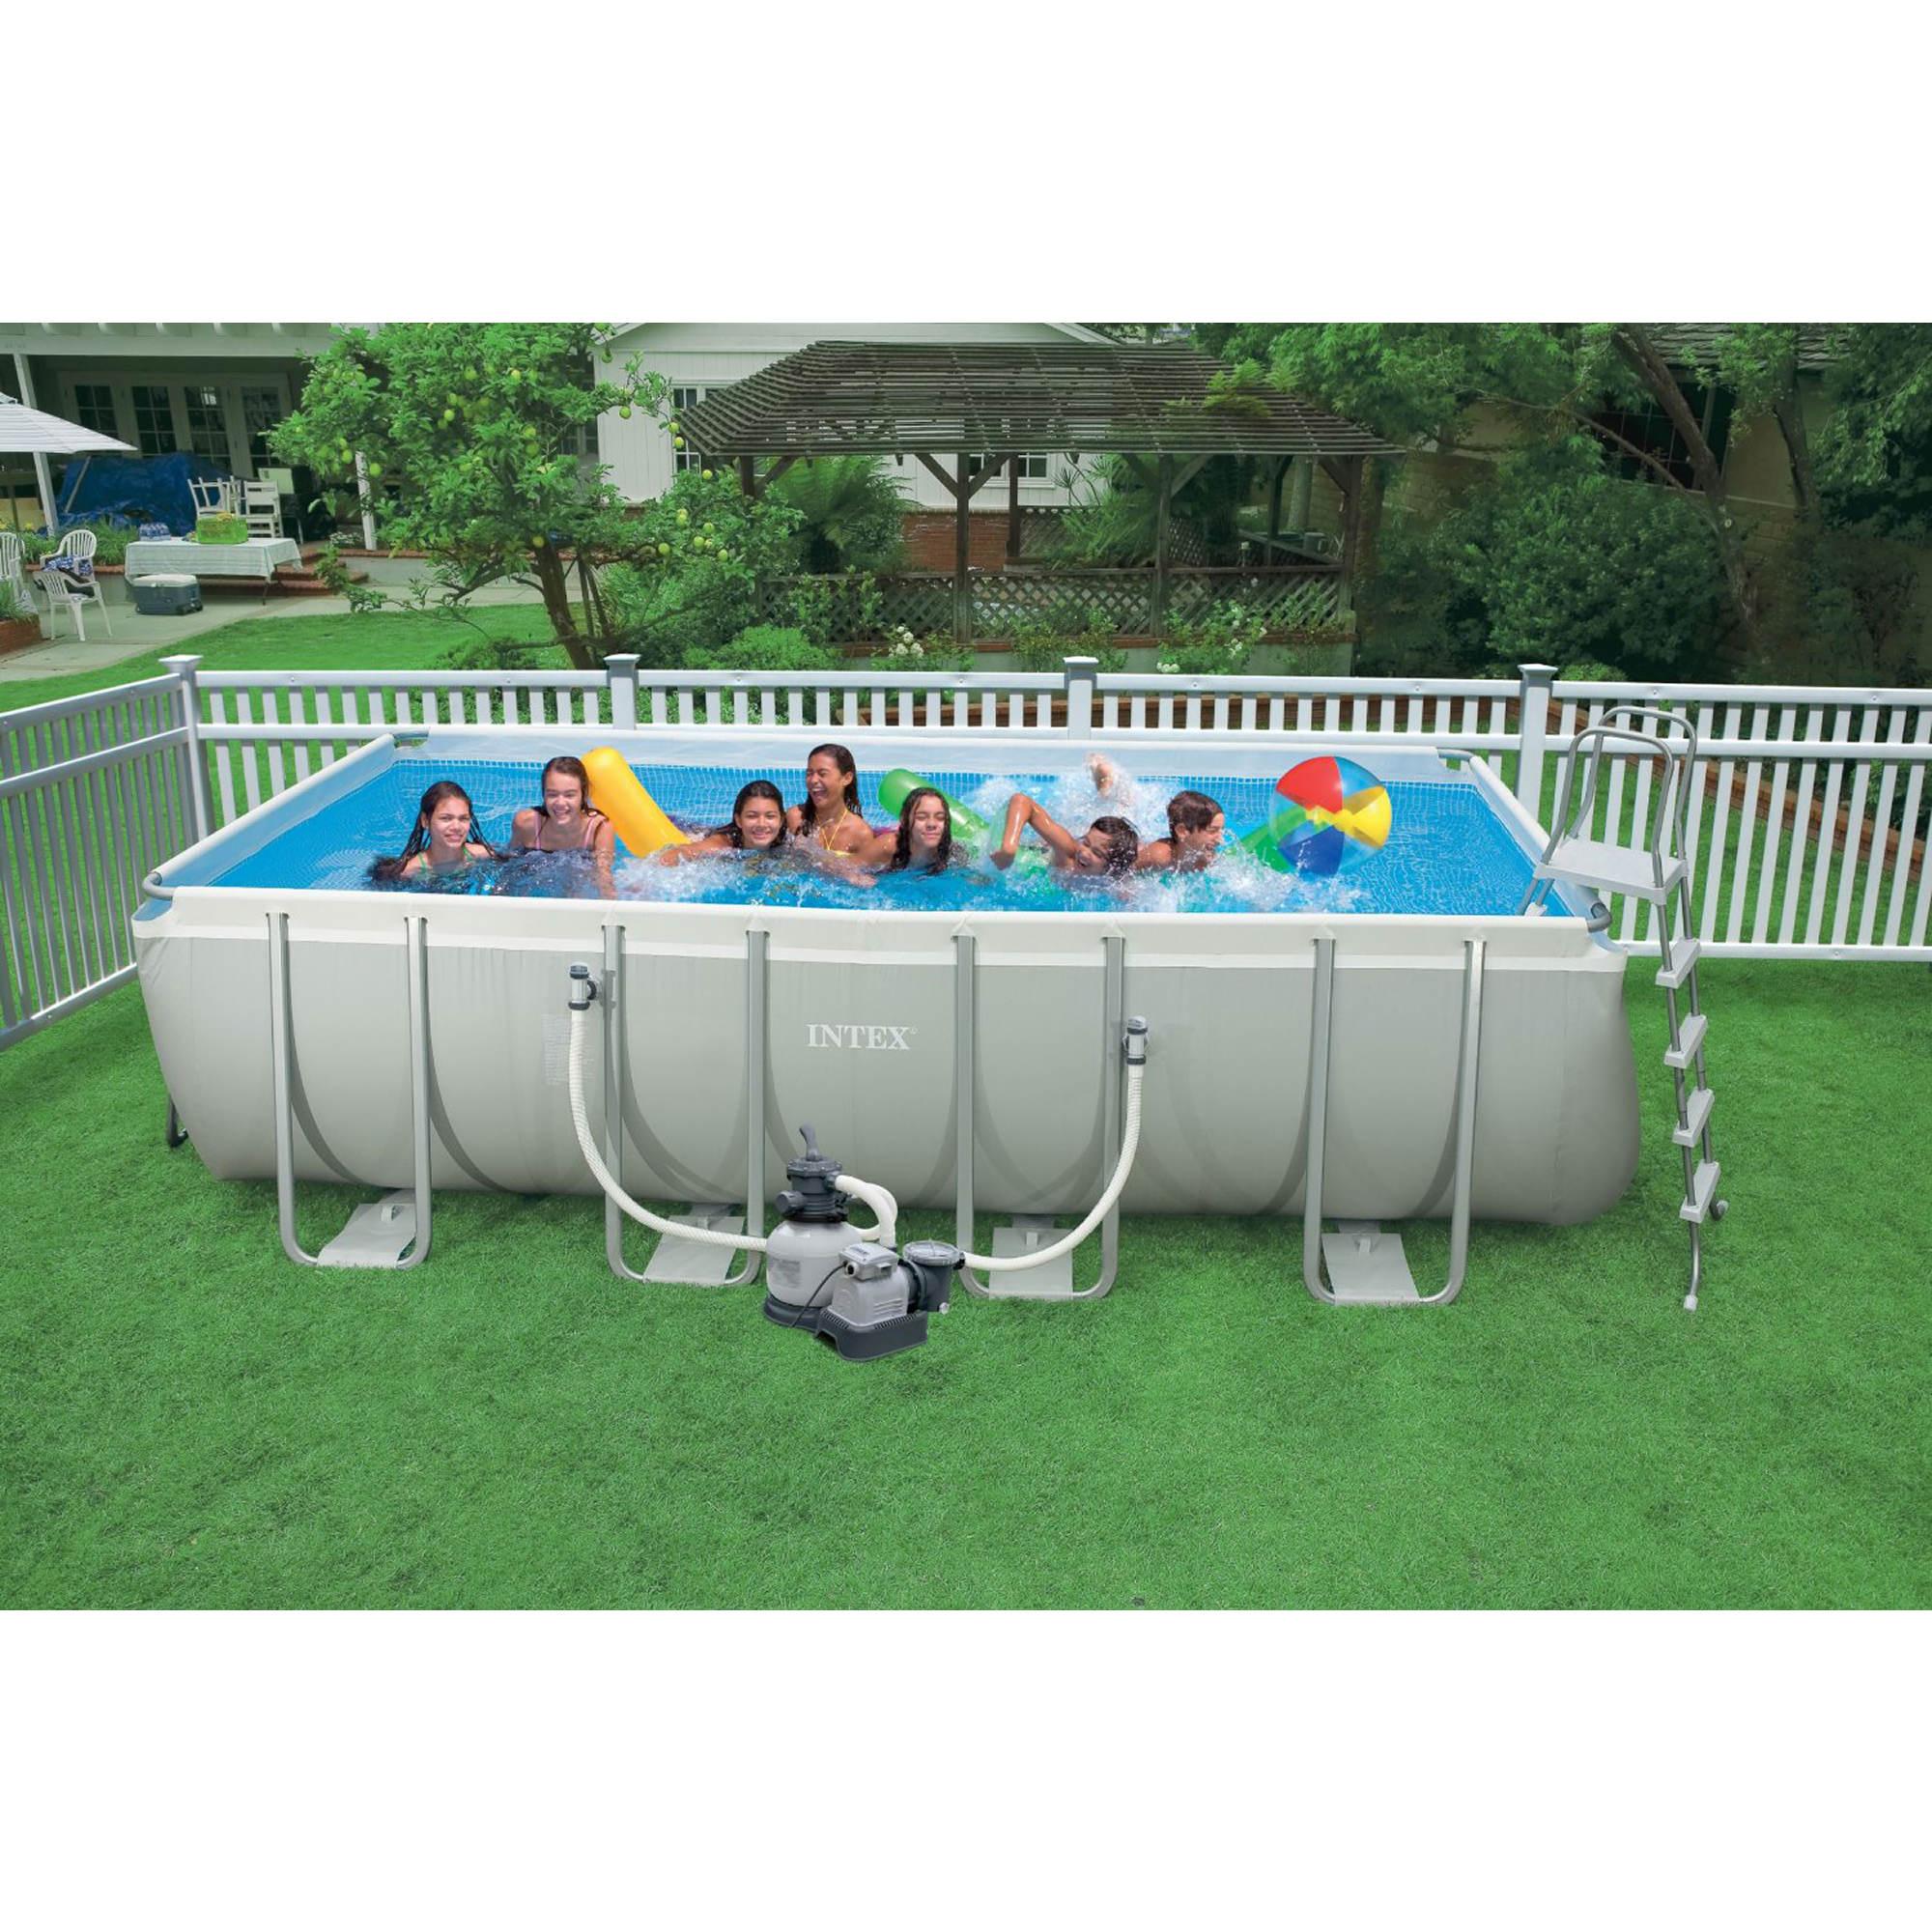 intex 18 x 9 x 52 rectangular aboveground ultra frame pool